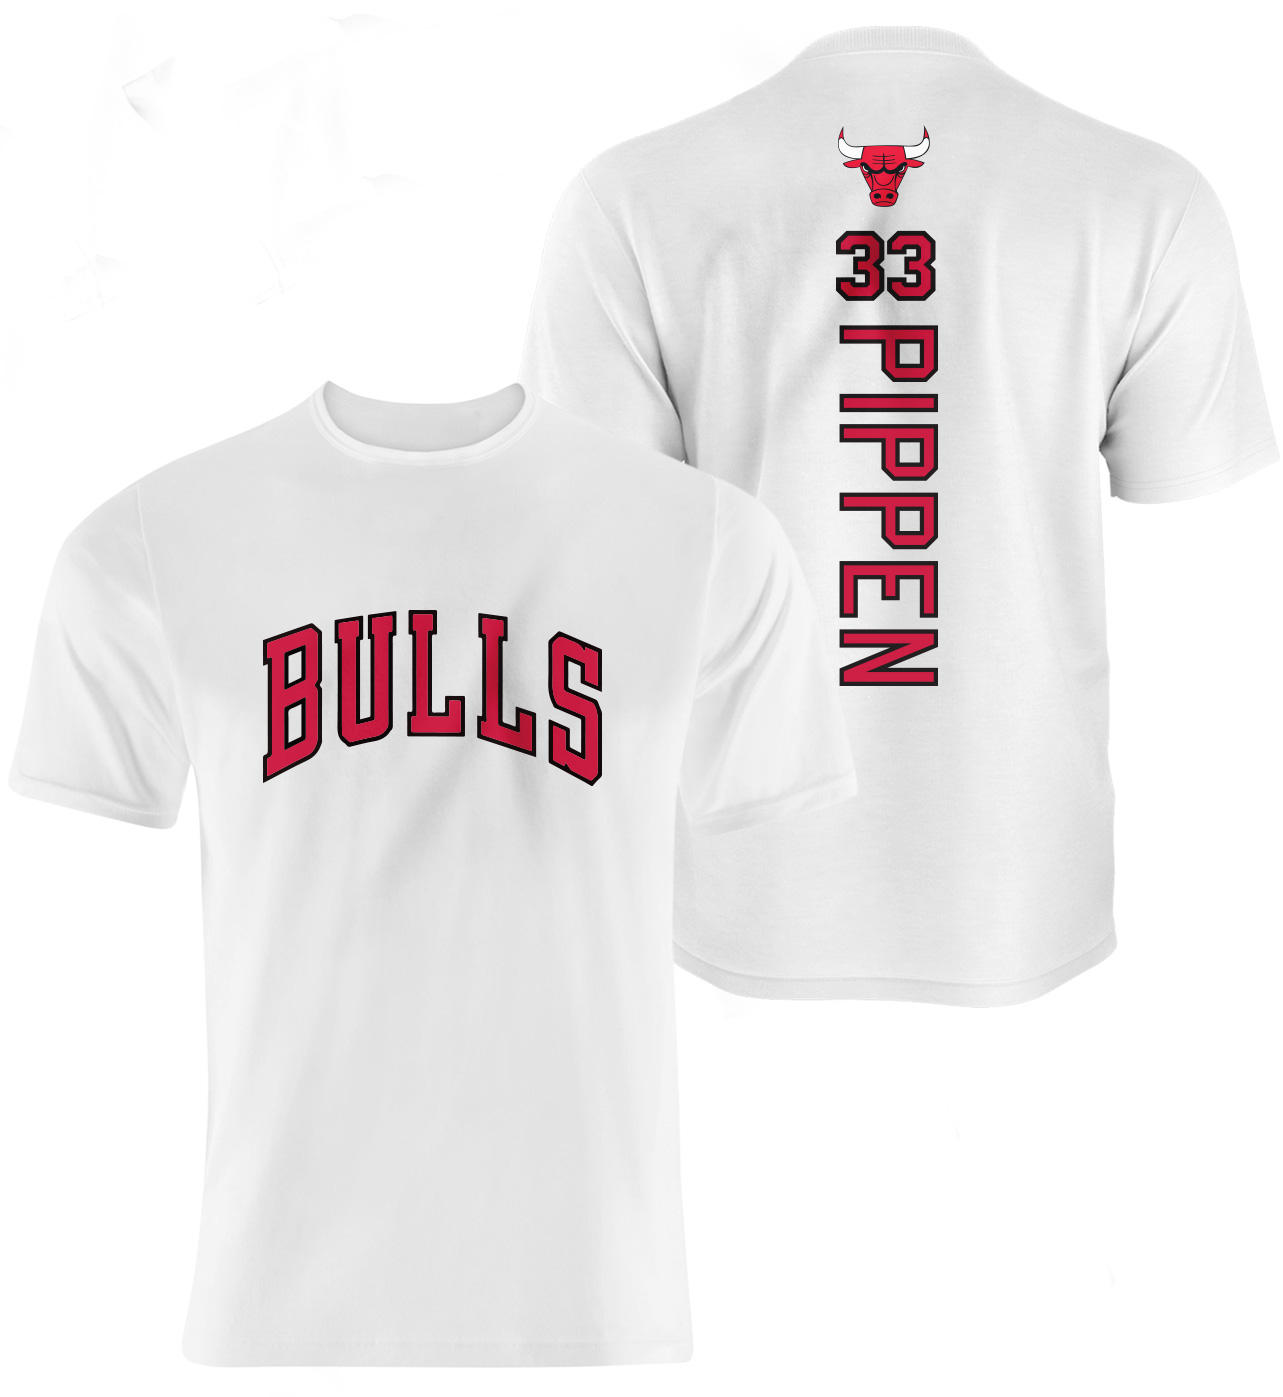 Chicago Bulls Scottie Pippen Vertical Tshirt (TSH-WHT-50-NBA-PLYR-CHI-PIPPEN.VER)